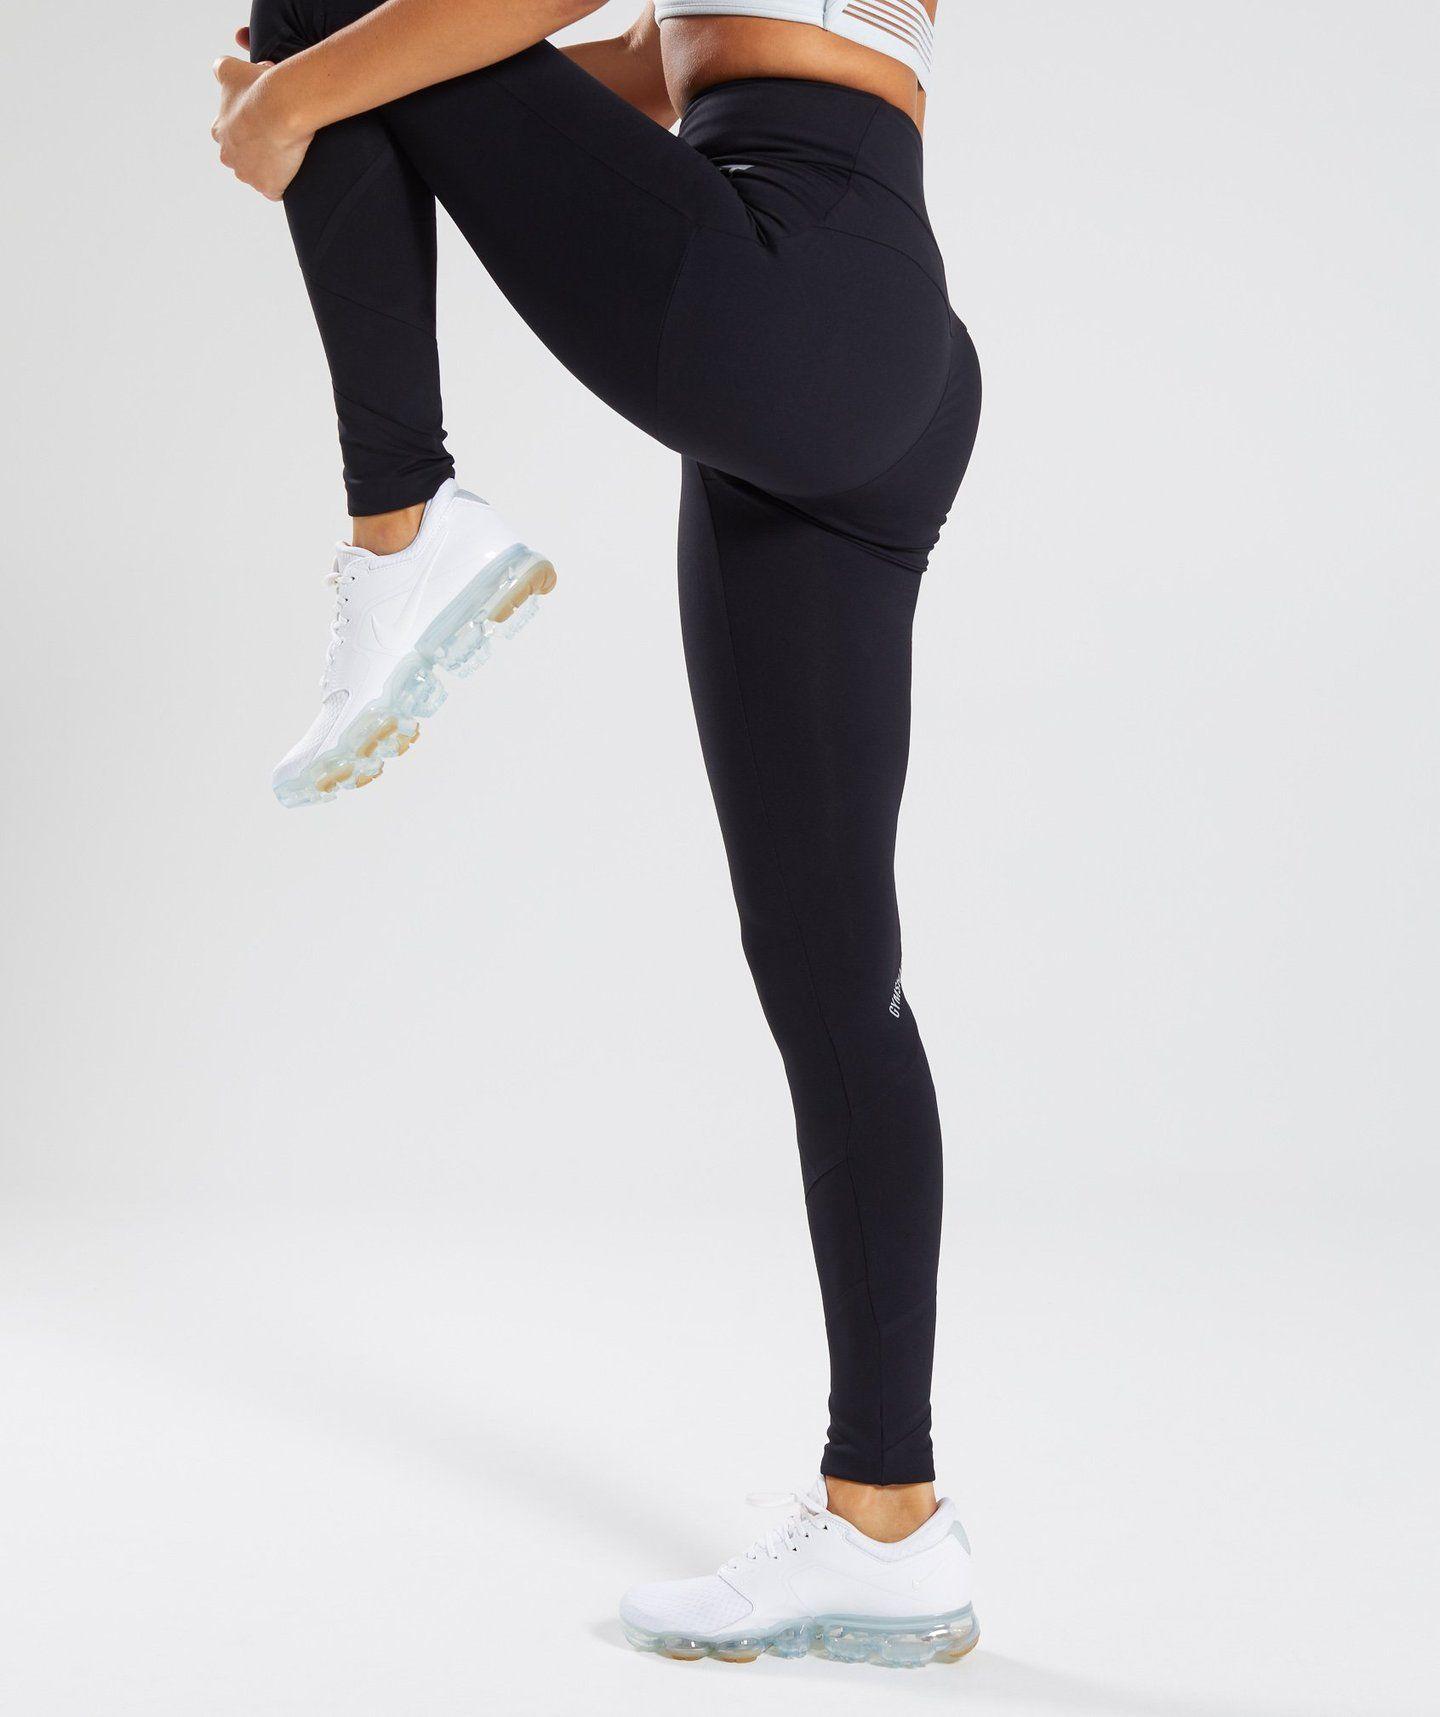 c0018604c79b6 Gymshark Fused Ankle Leggings - Black | Clothes to buy | Black ...